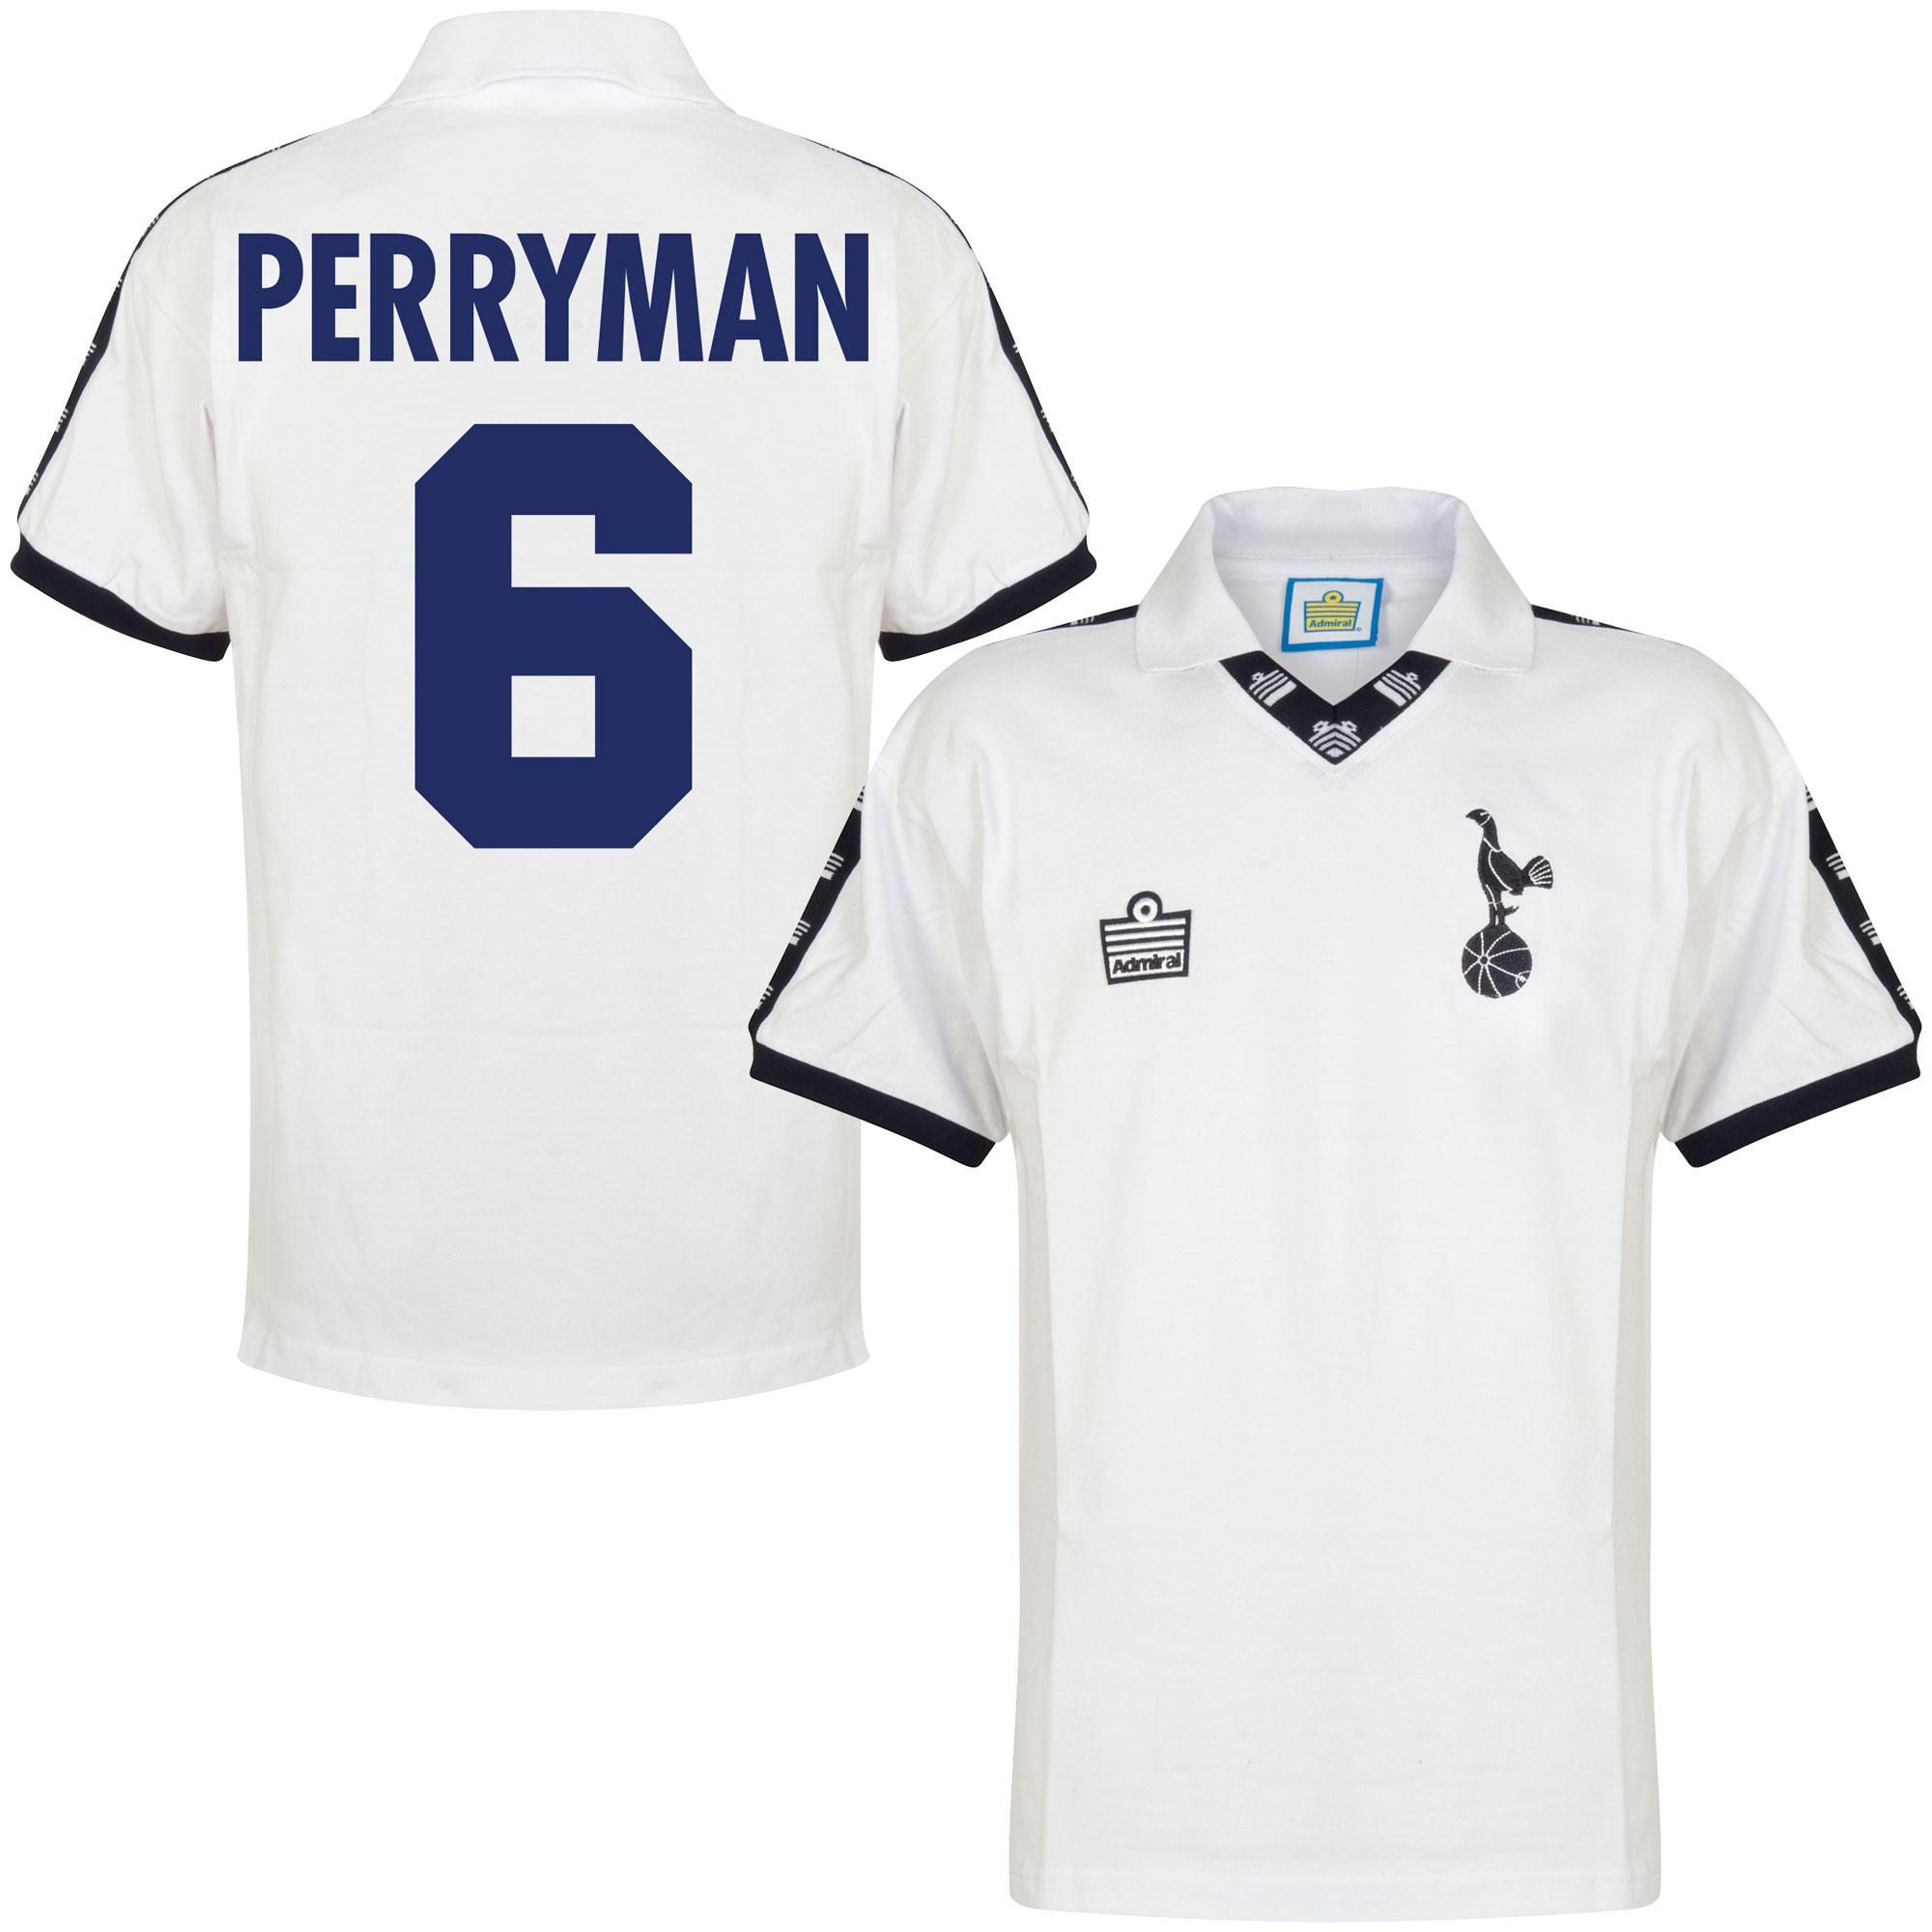 Admiral Tottenham Hotspur Home Perryman 6 Retro Shirt 1977-1978